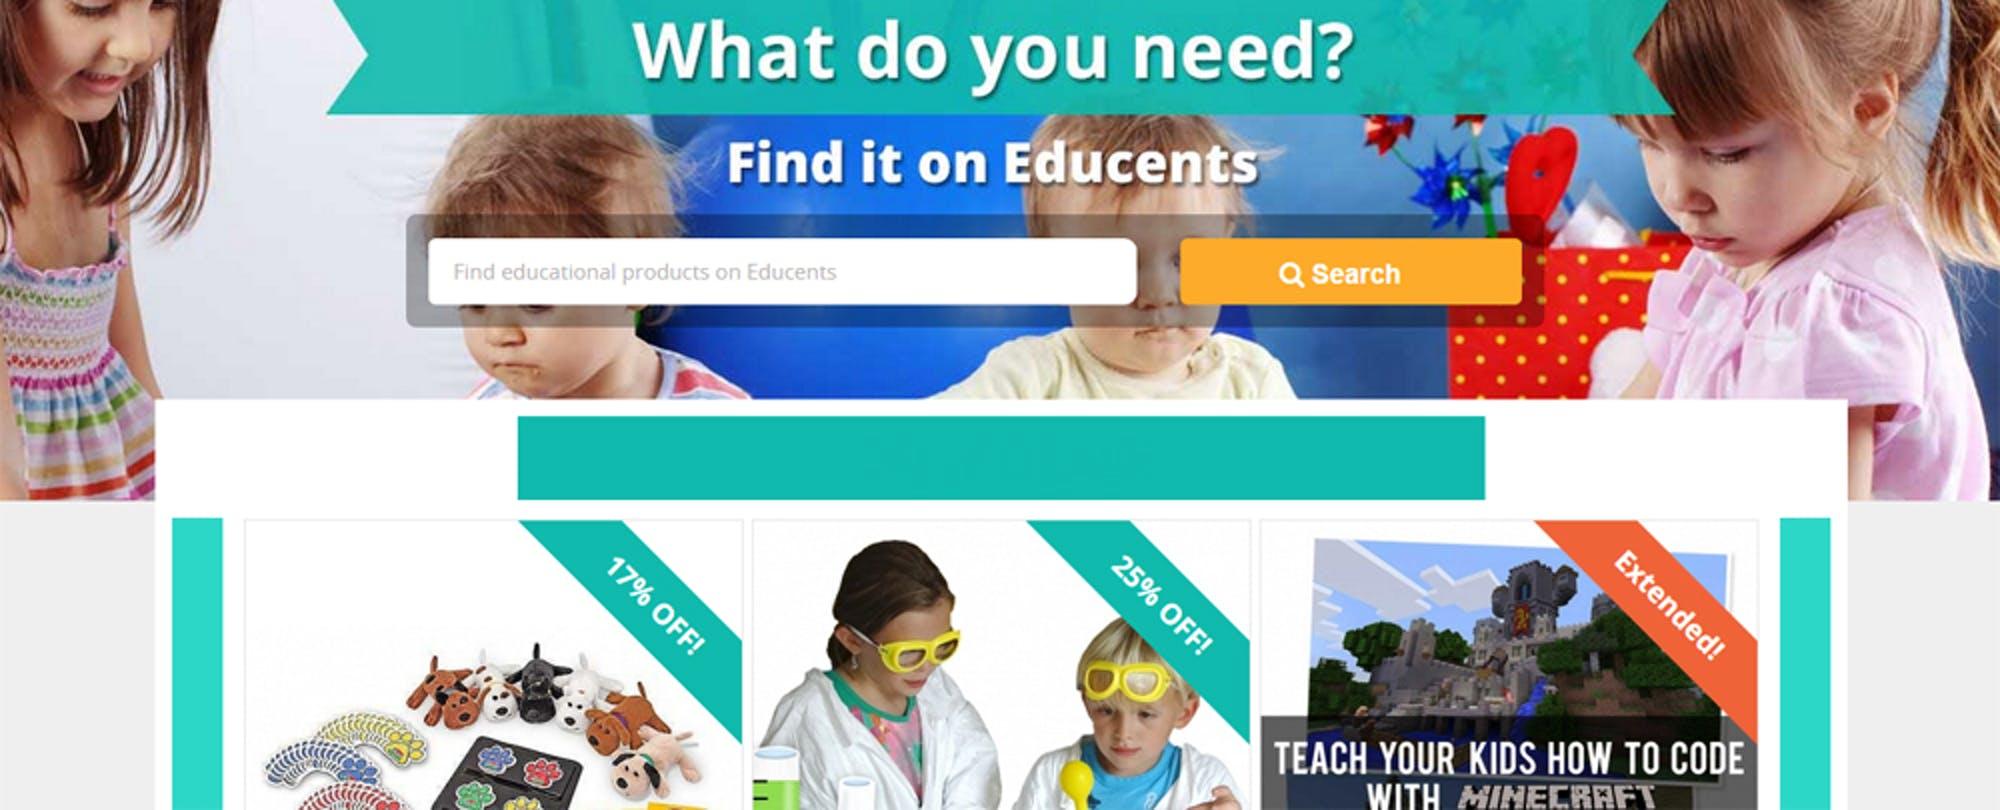 Dollars and Sense: Educents Raises $2.9M to Grow Instructional Materials Marketplace